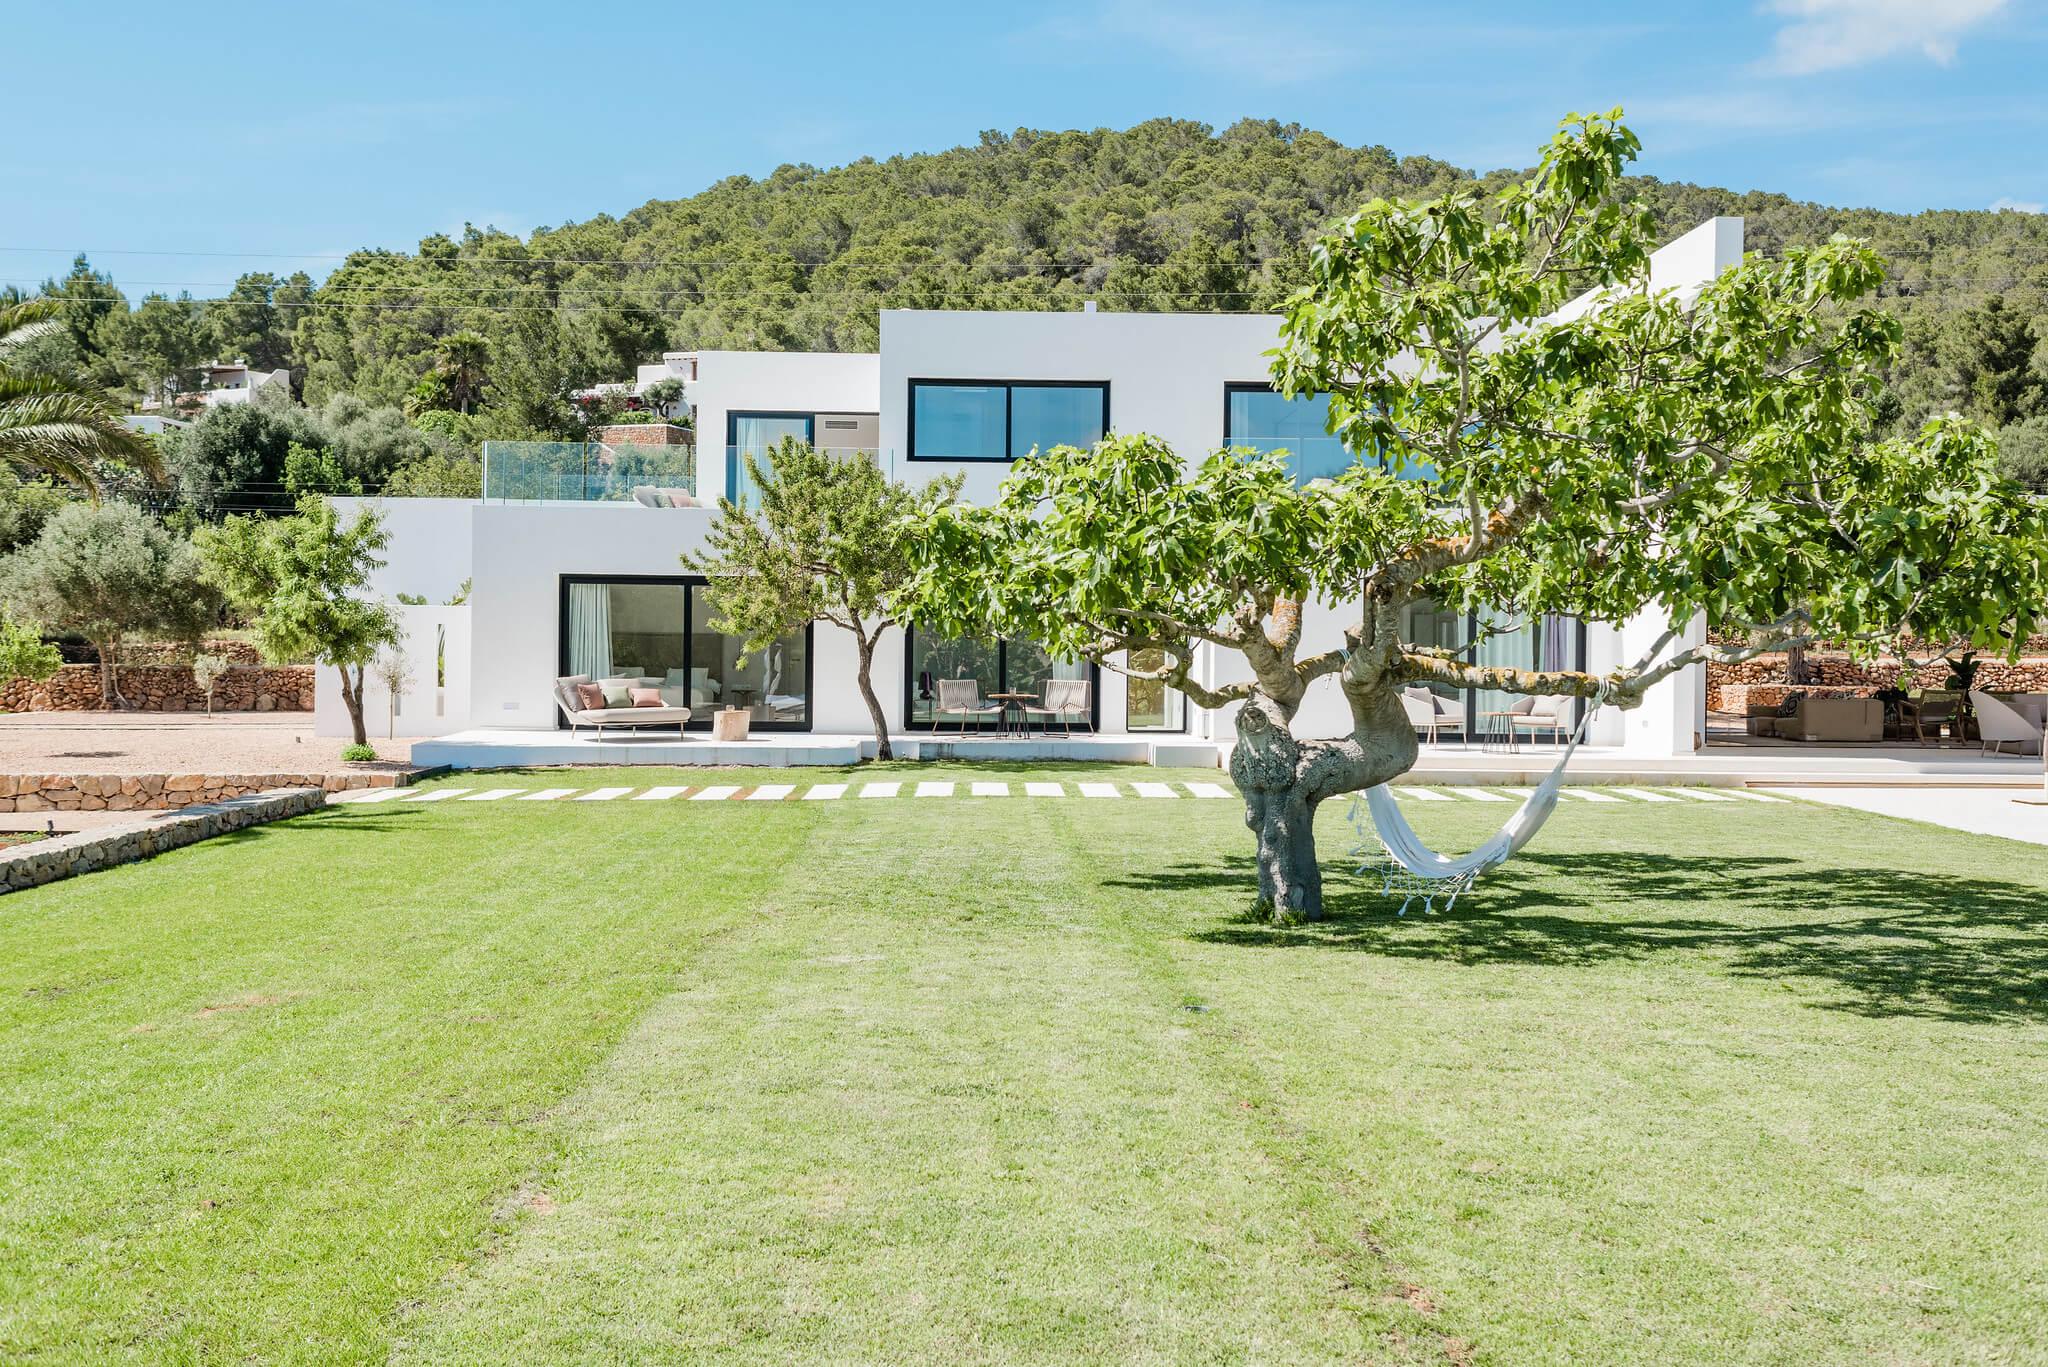 https://www.white-ibiza.com/wp-content/uploads/2020/06/white-ibiza-villas-can-carmen-exterior-across-lawn.jpg